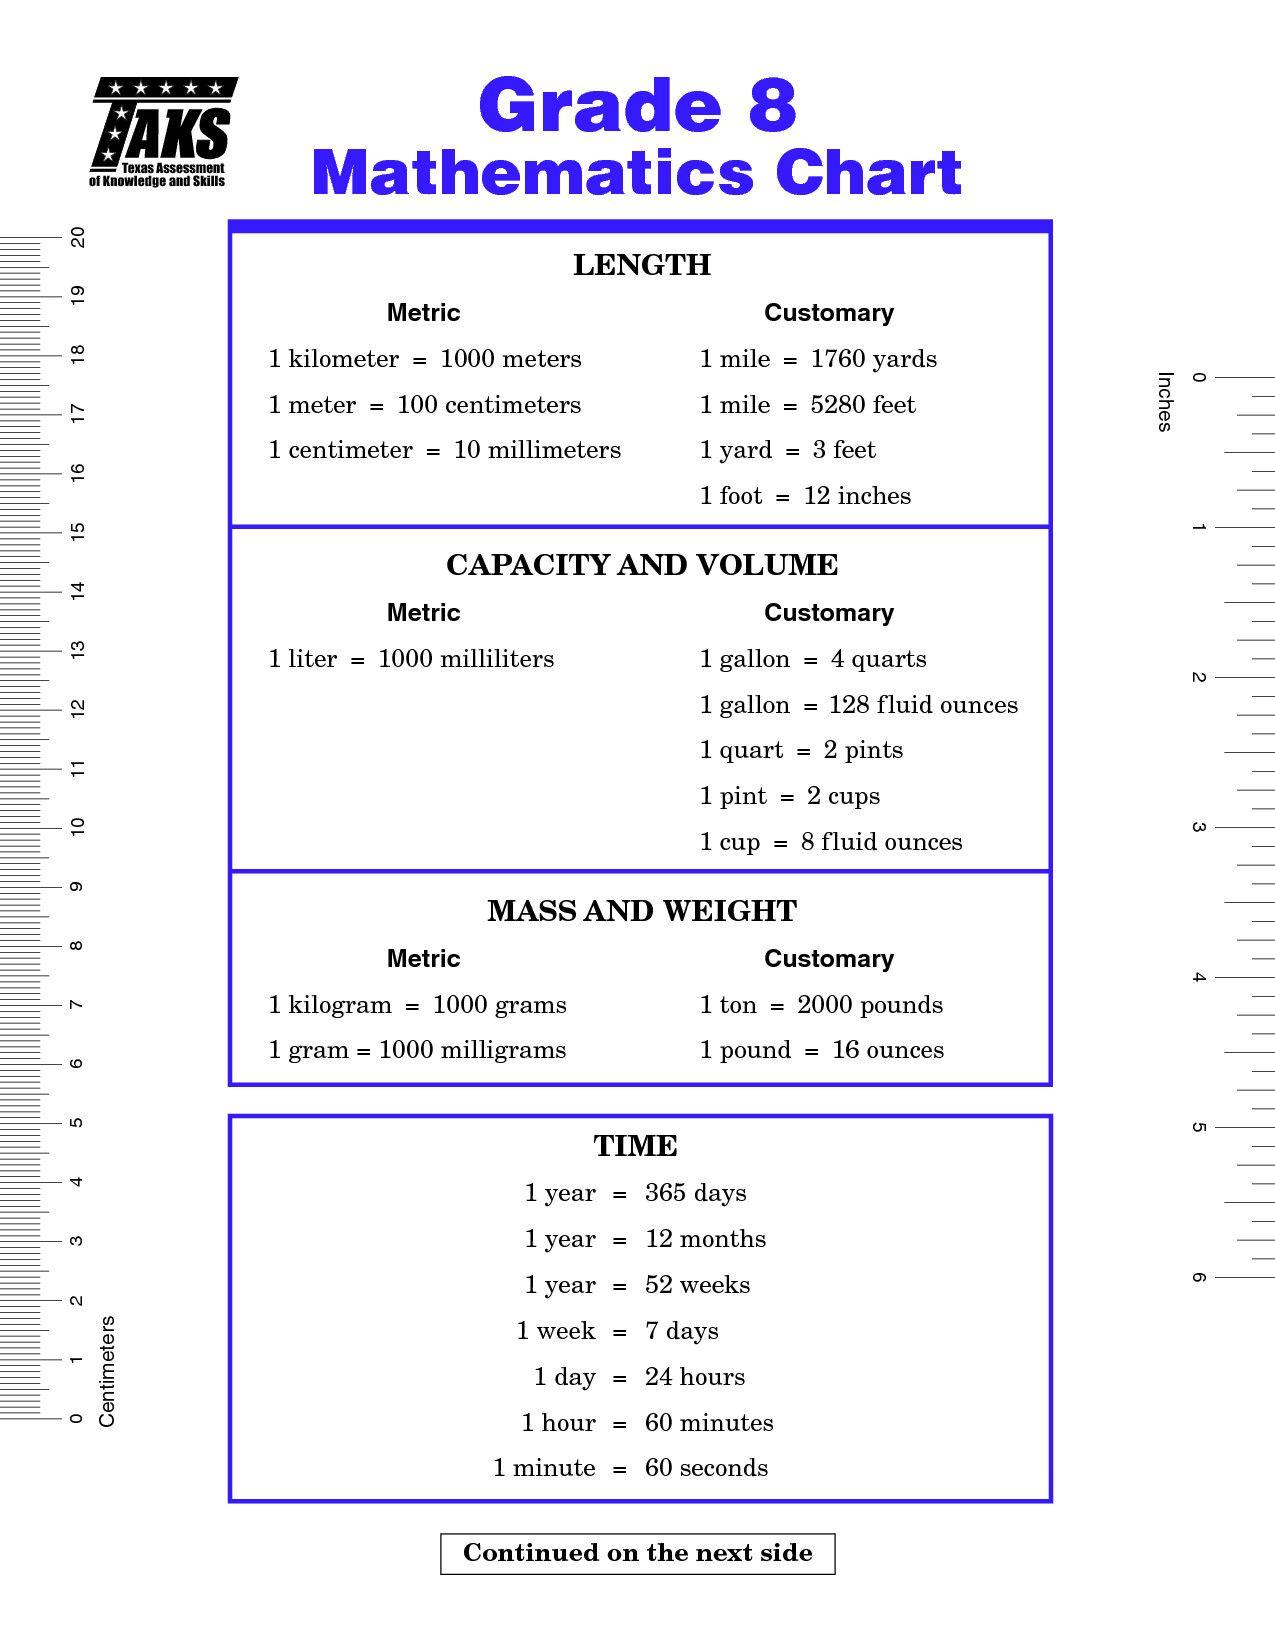 5 Free Math Worksheets Second Grade 2 Measurement Metric Units Mass Kg Gm 8  8th g…   2nd grade math worksheets [ 1650 x 1275 Pixel ]